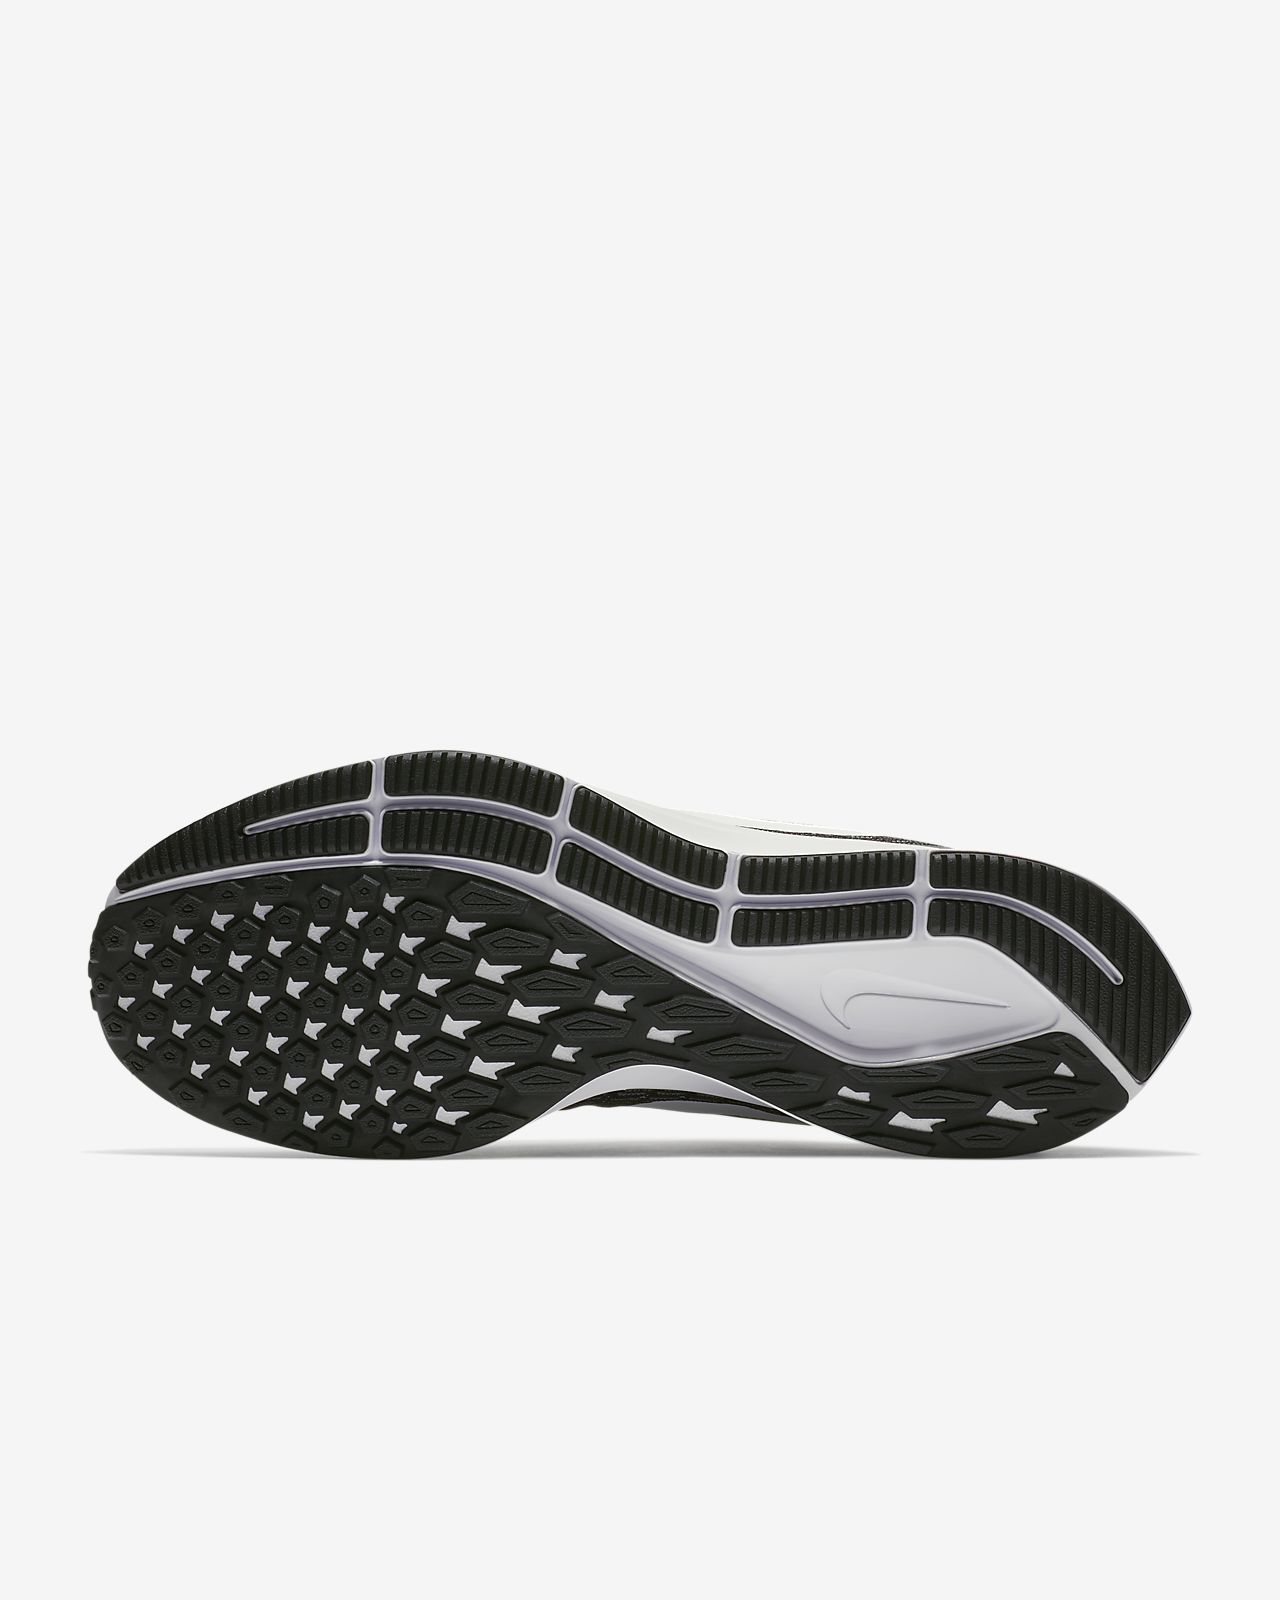 promo code a0857 dff14 ... Chaussure de running Nike Air Zoom Pegasus 35 pour Homme